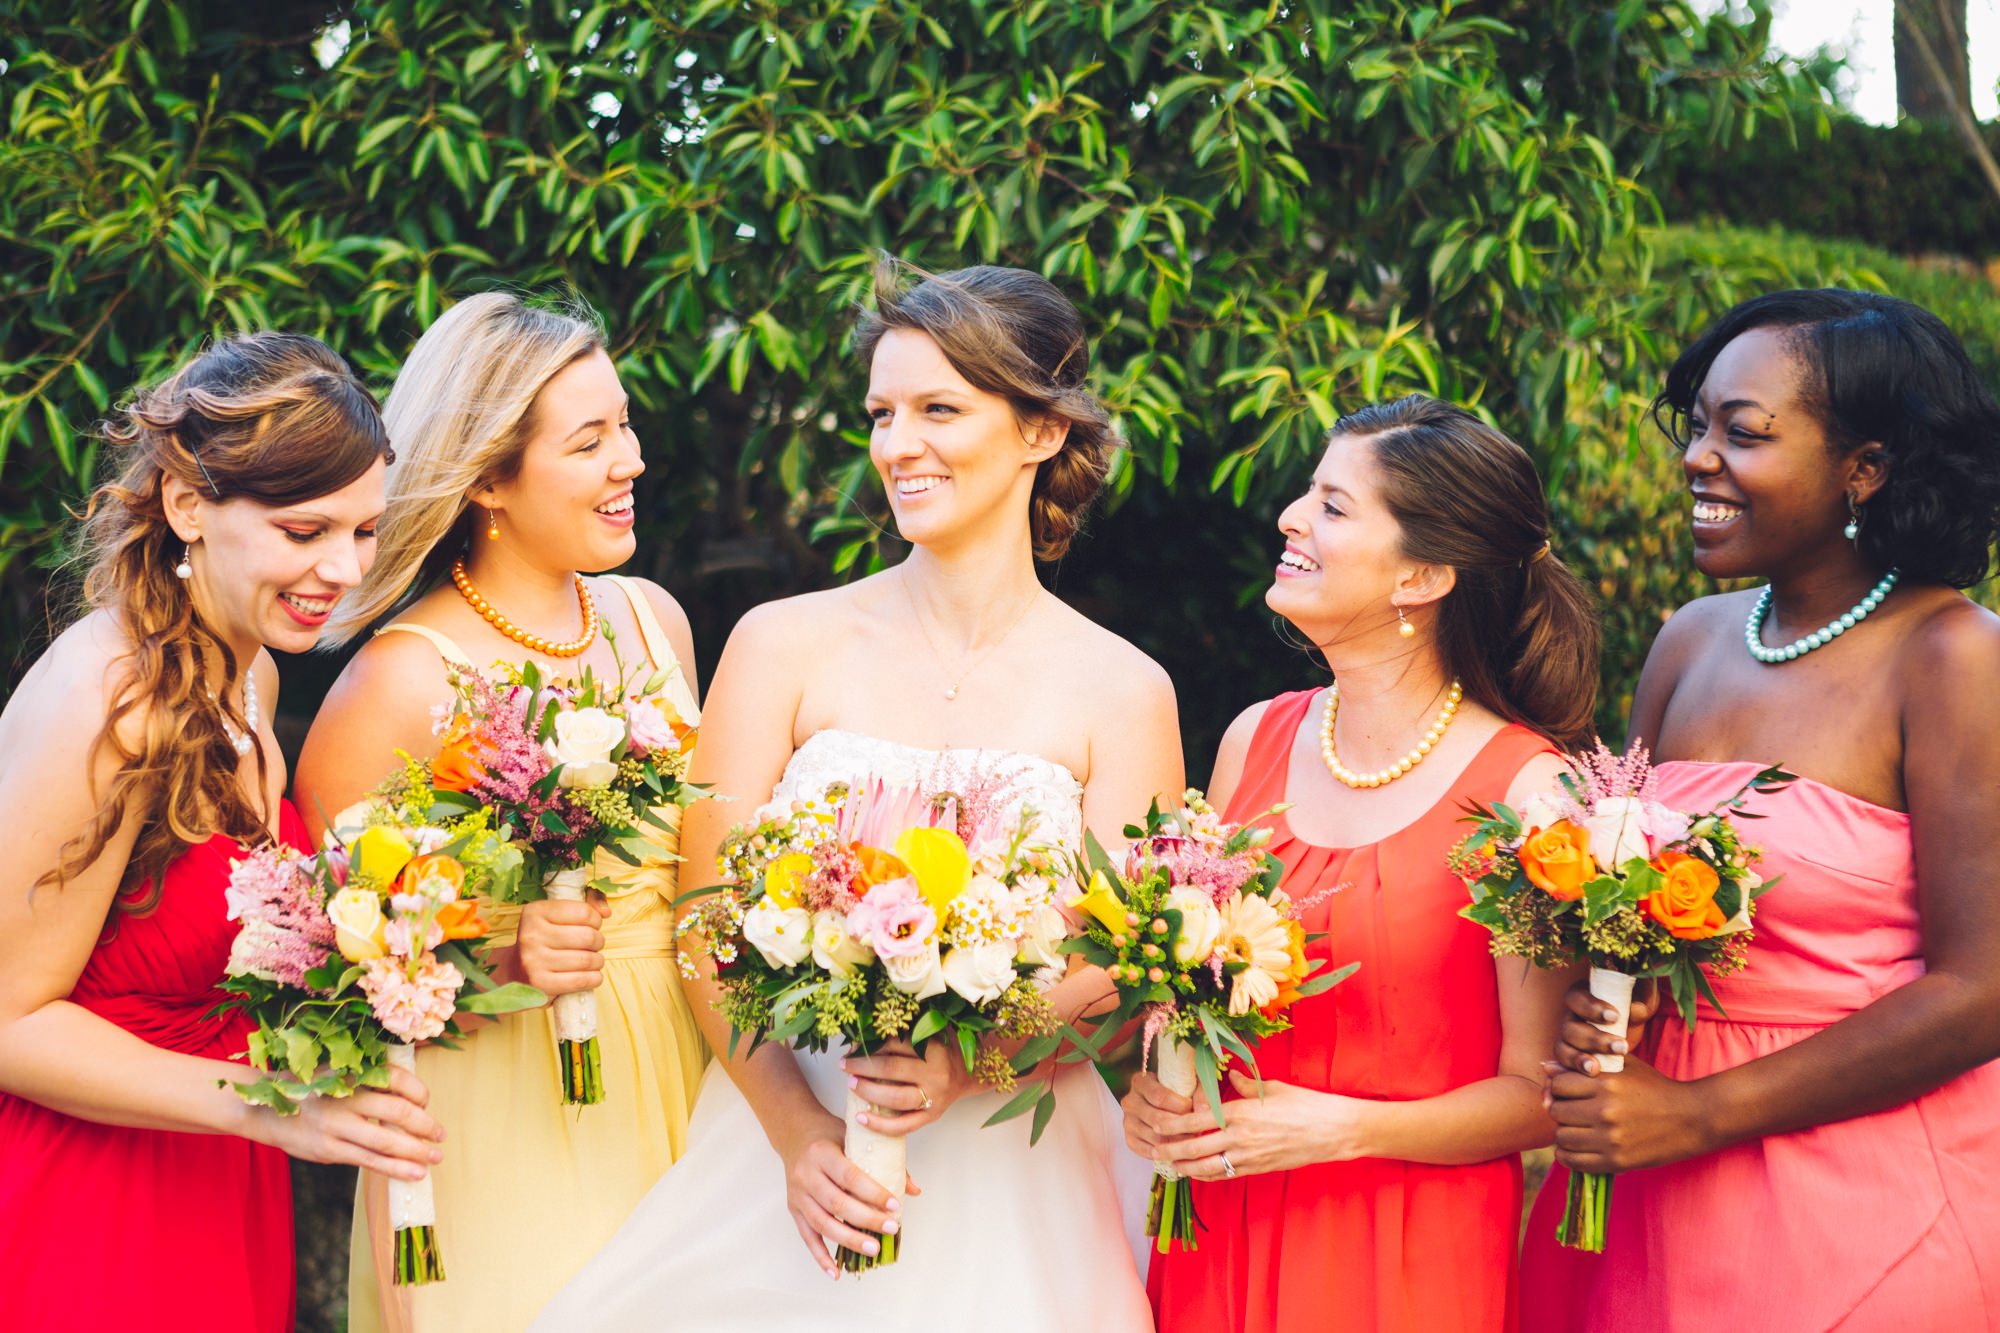 thelightandglass-wedding-engagement-photography-096.jpg